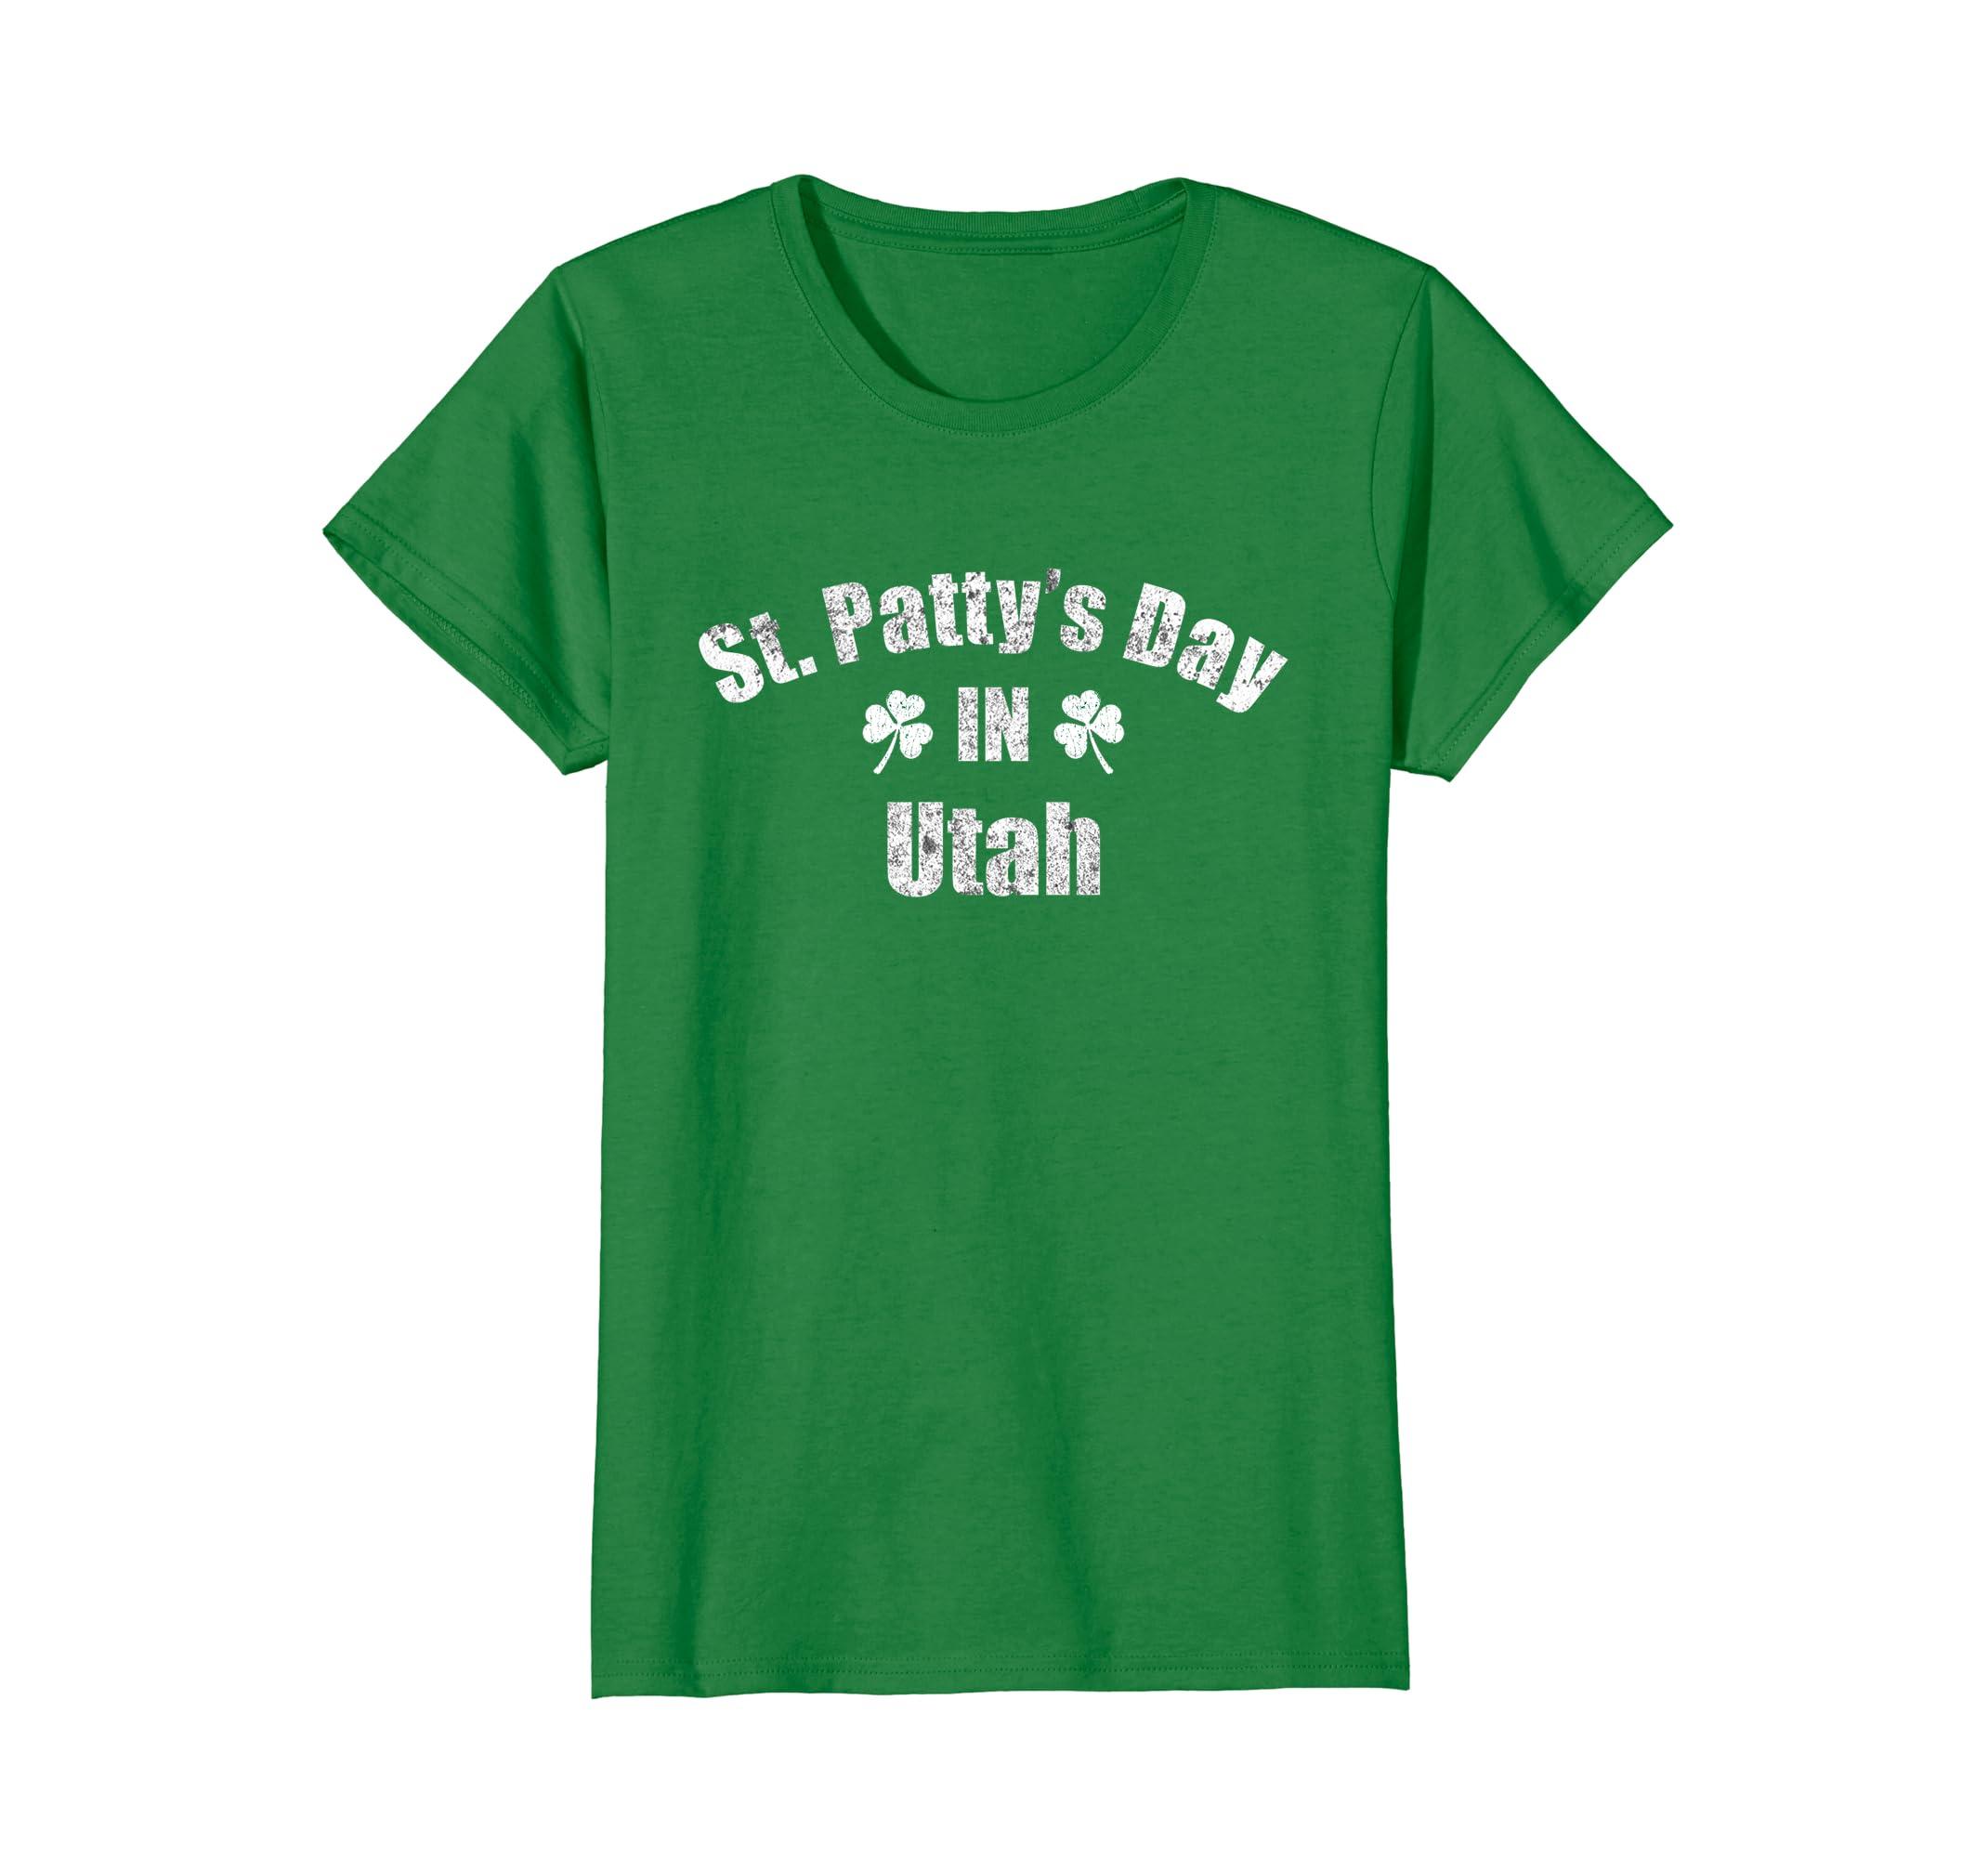 2018 Patty Day Shirt Patricks